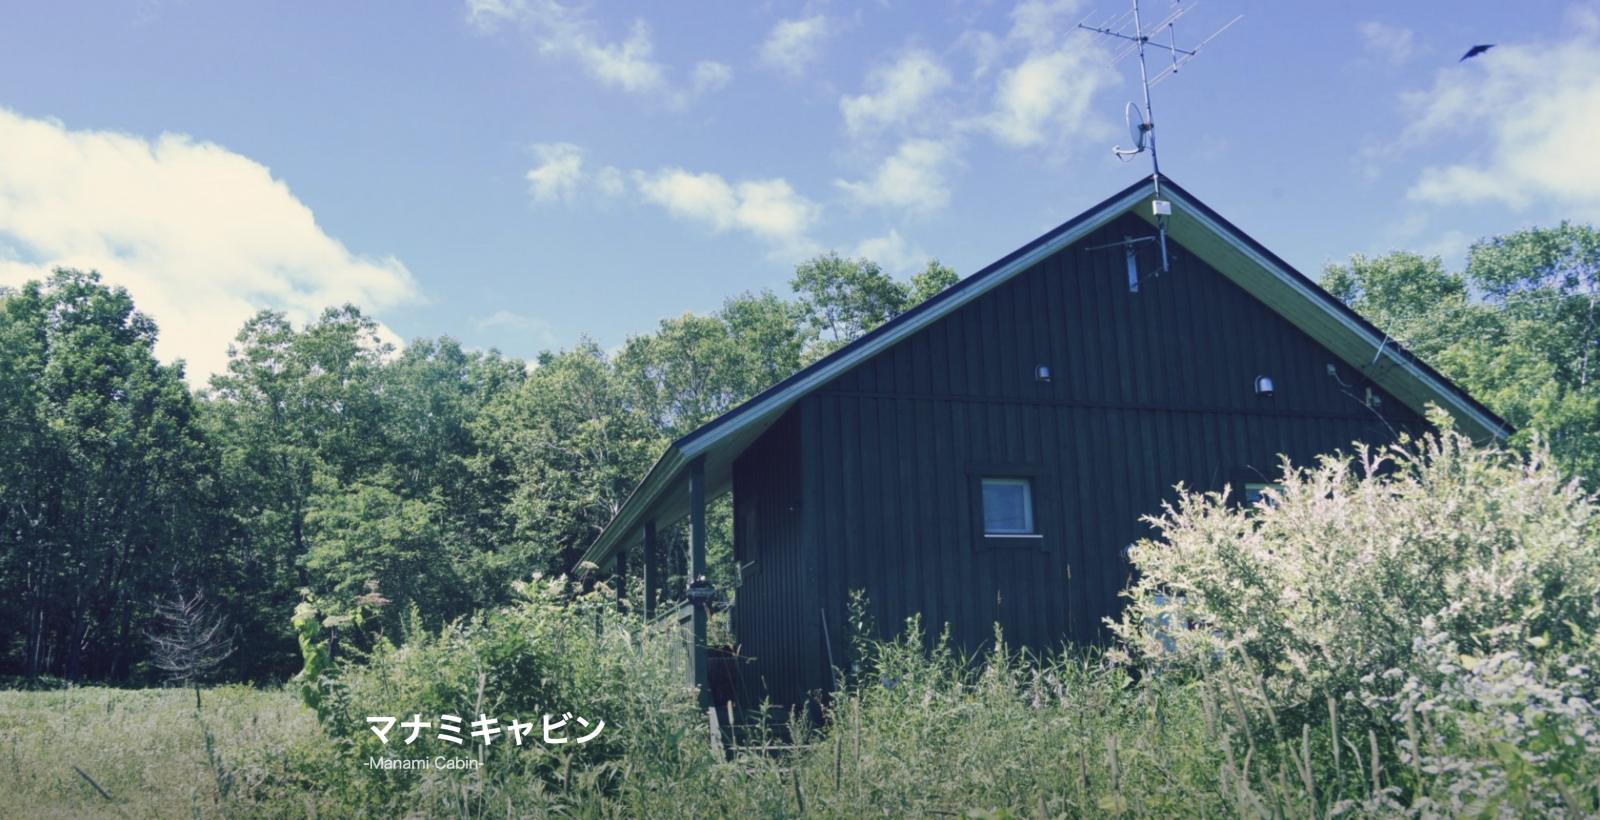 [Produce]鶴居村でキャビンの運営